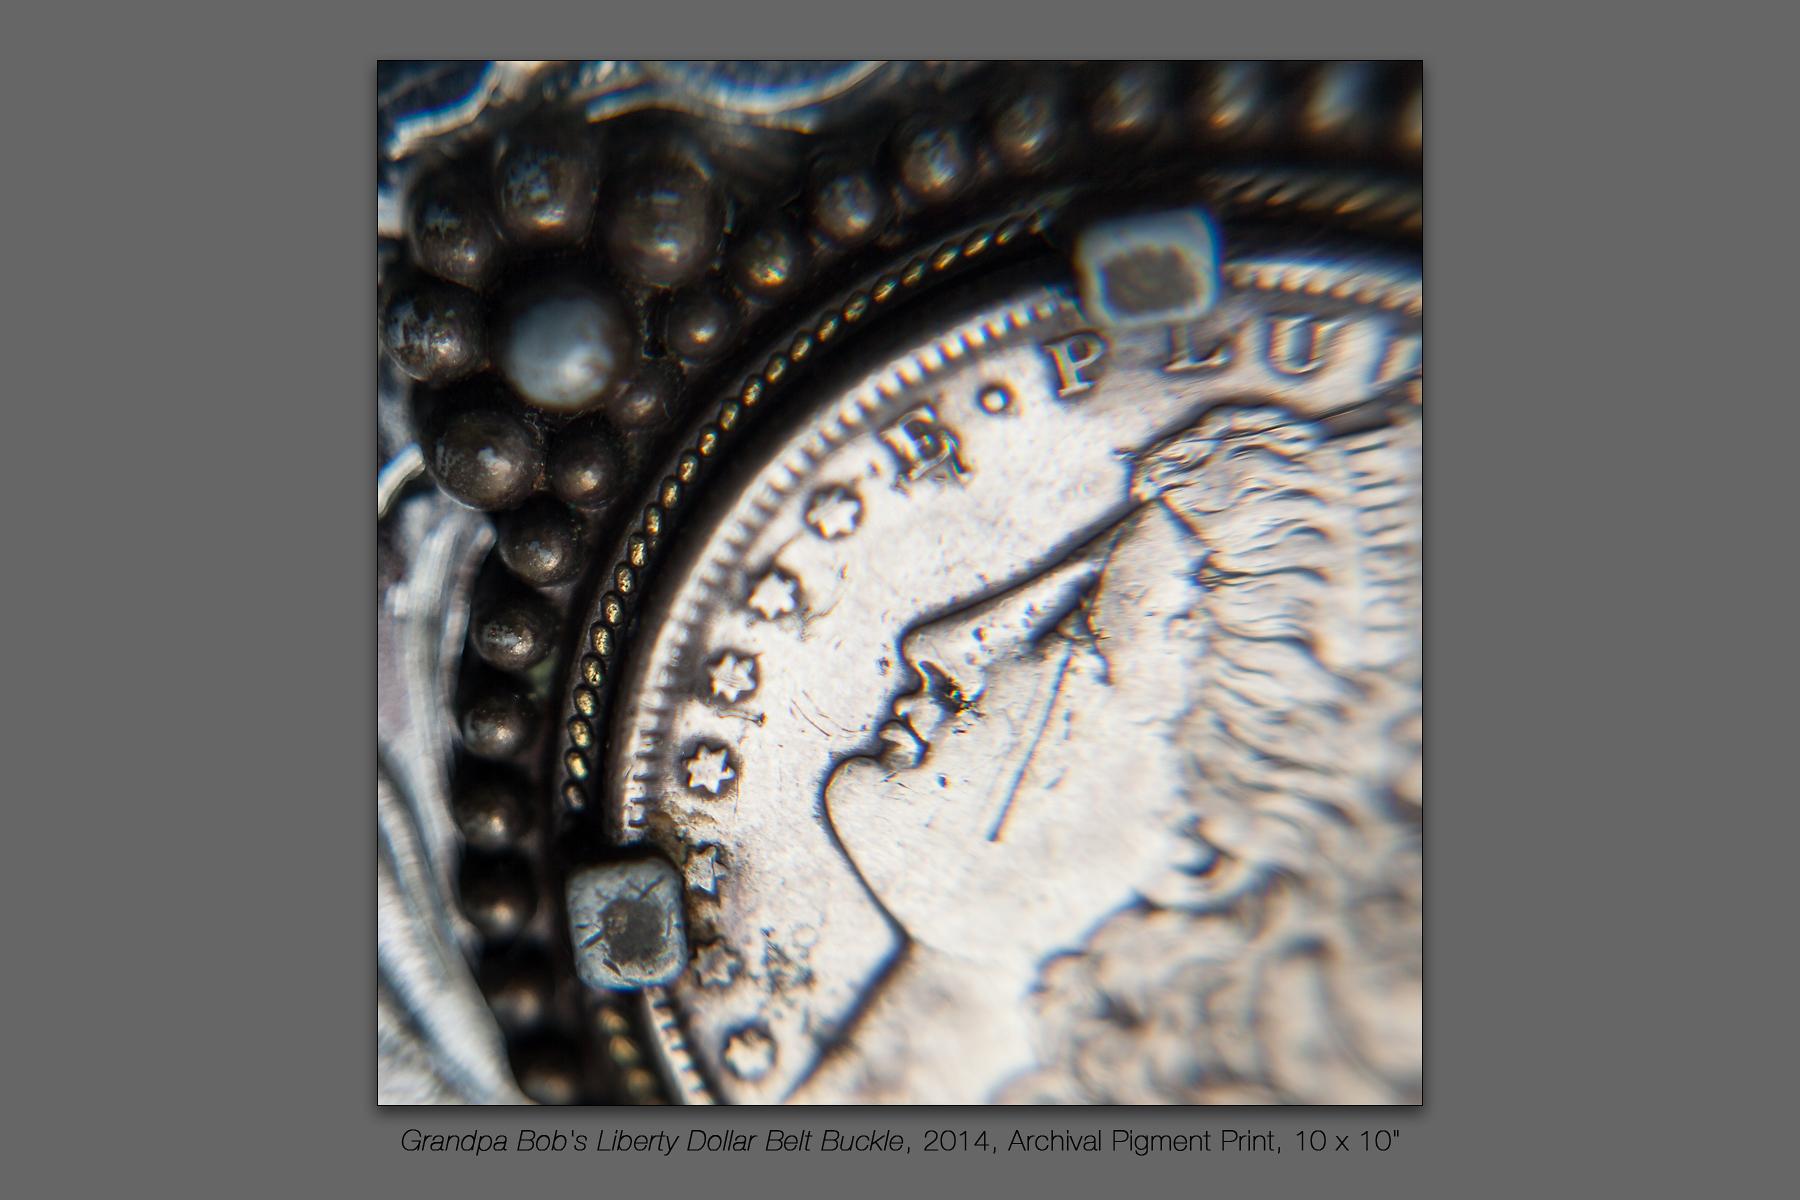 Grandpa Bob's Liberty Dollar Belt Buckle, 2014